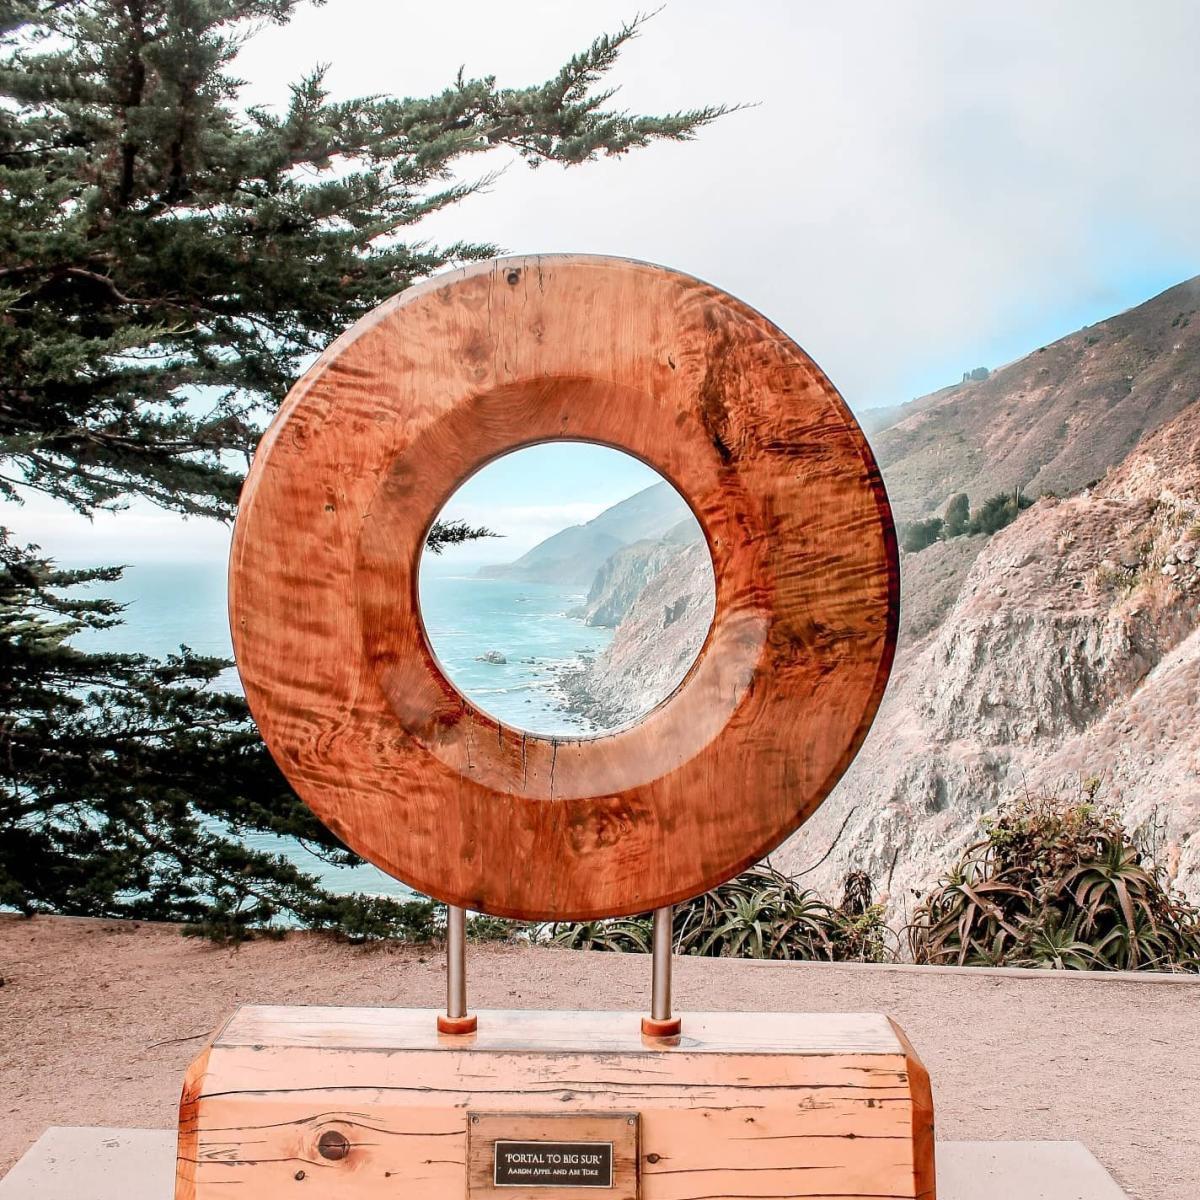 Portal To Big Sur Sculpture at ragged point in San Luis Obispo